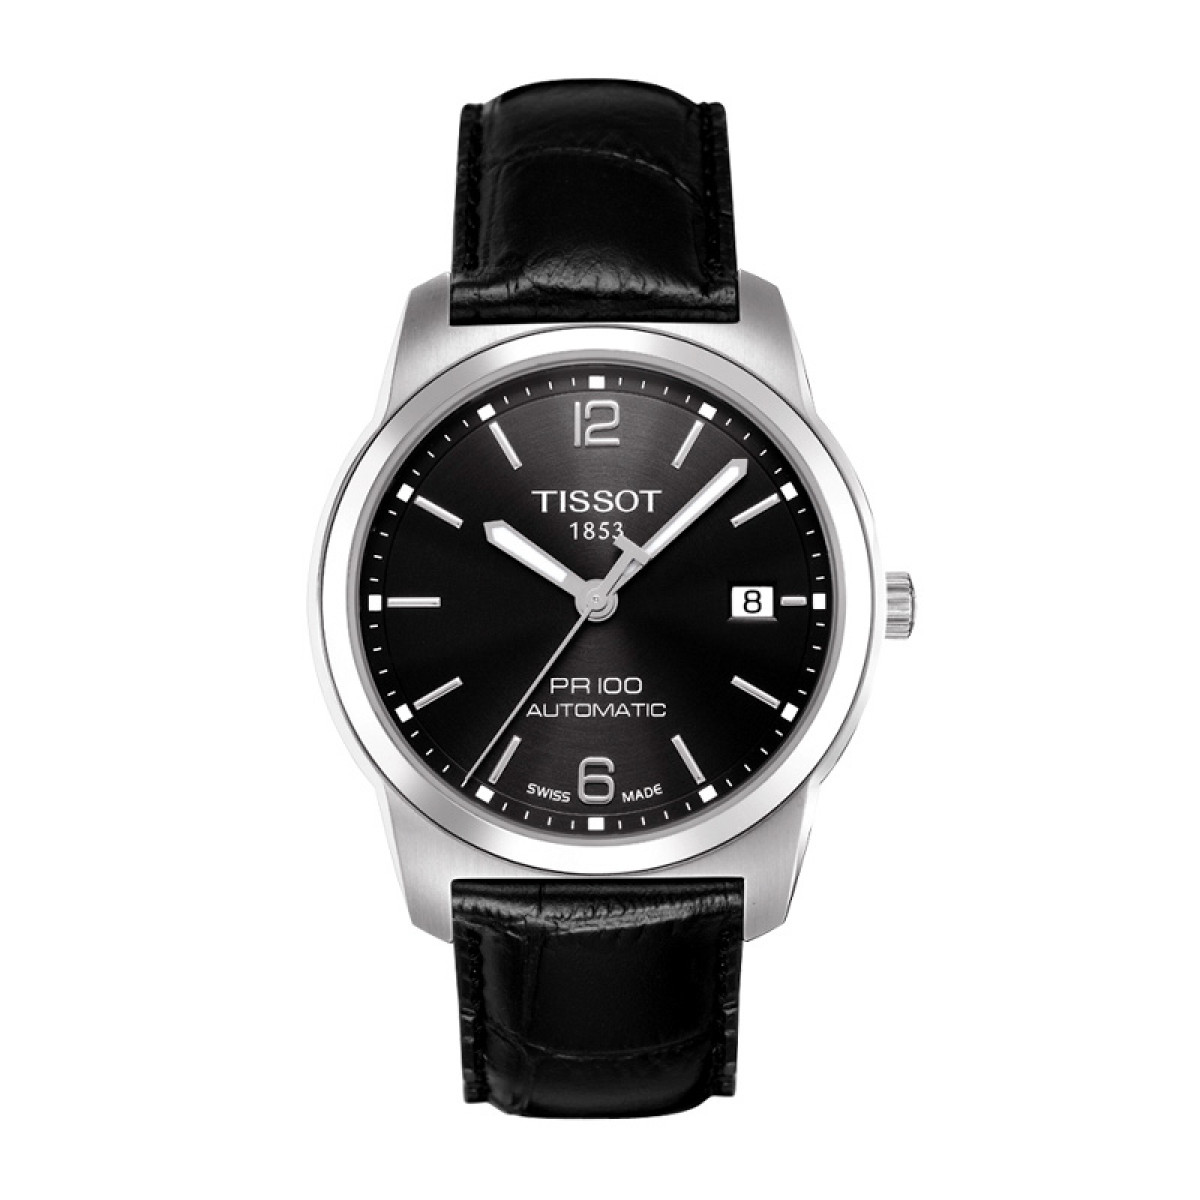 Часовник Tissot T049.407.16.057.00